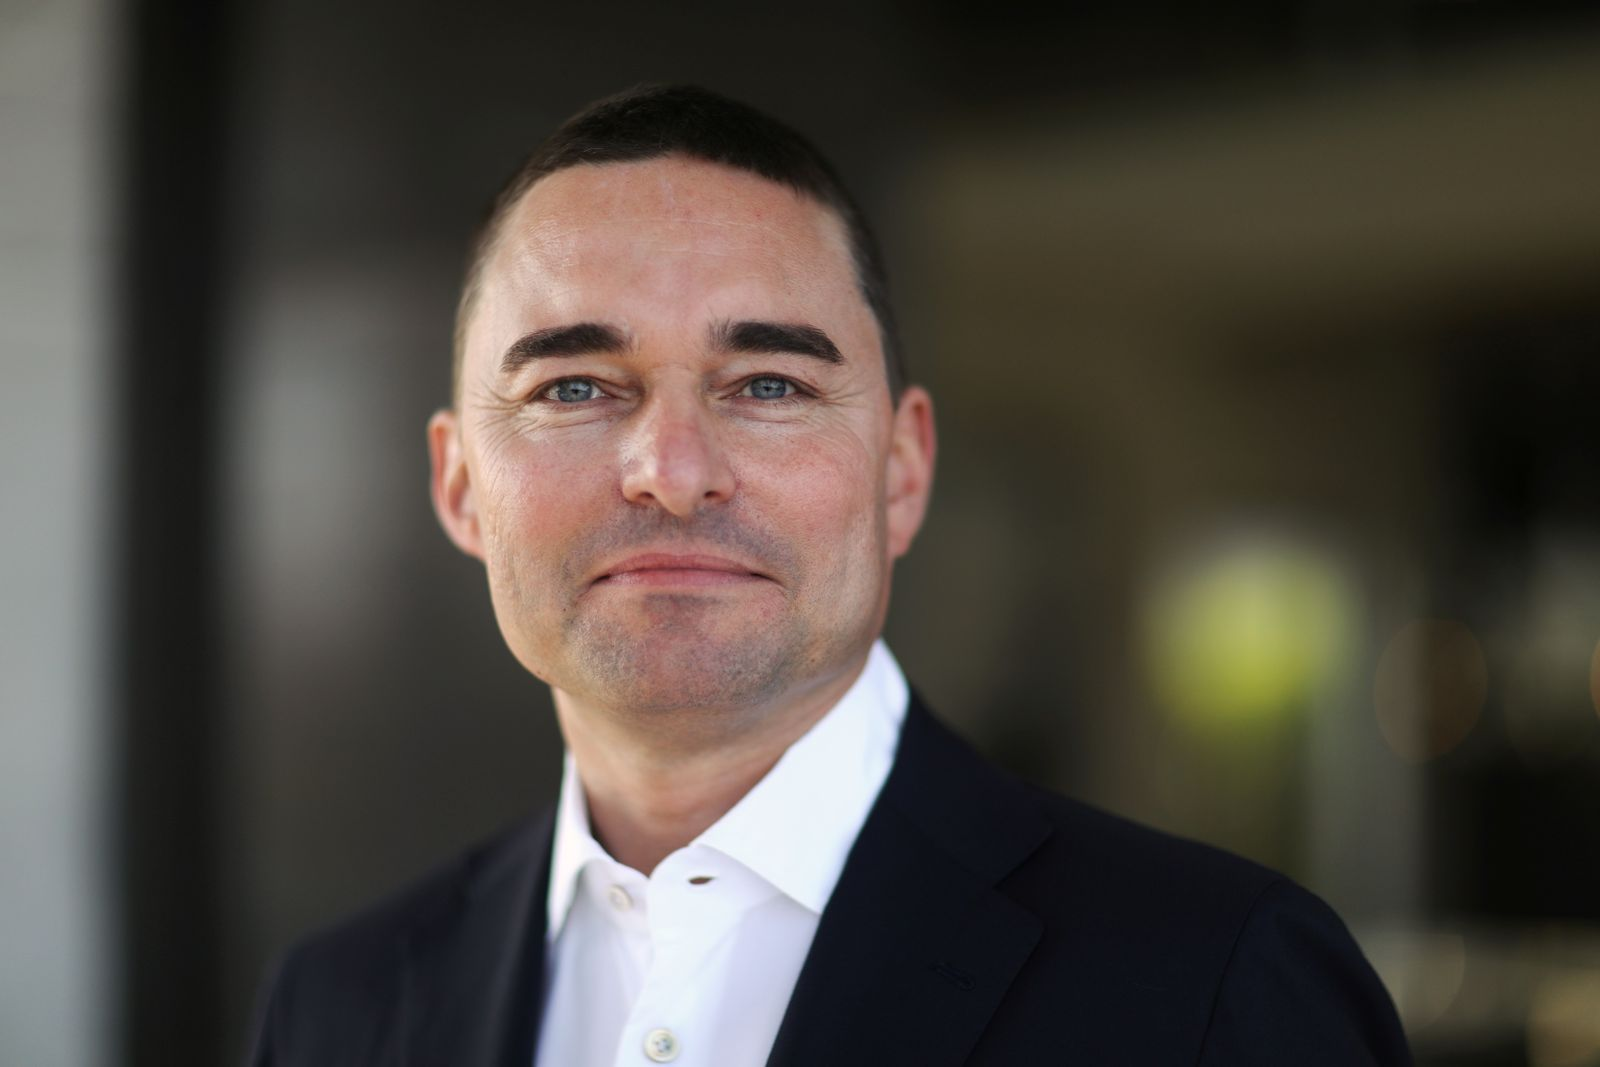 German investor Lars Windhorst poses for a portrait in Los Angeles